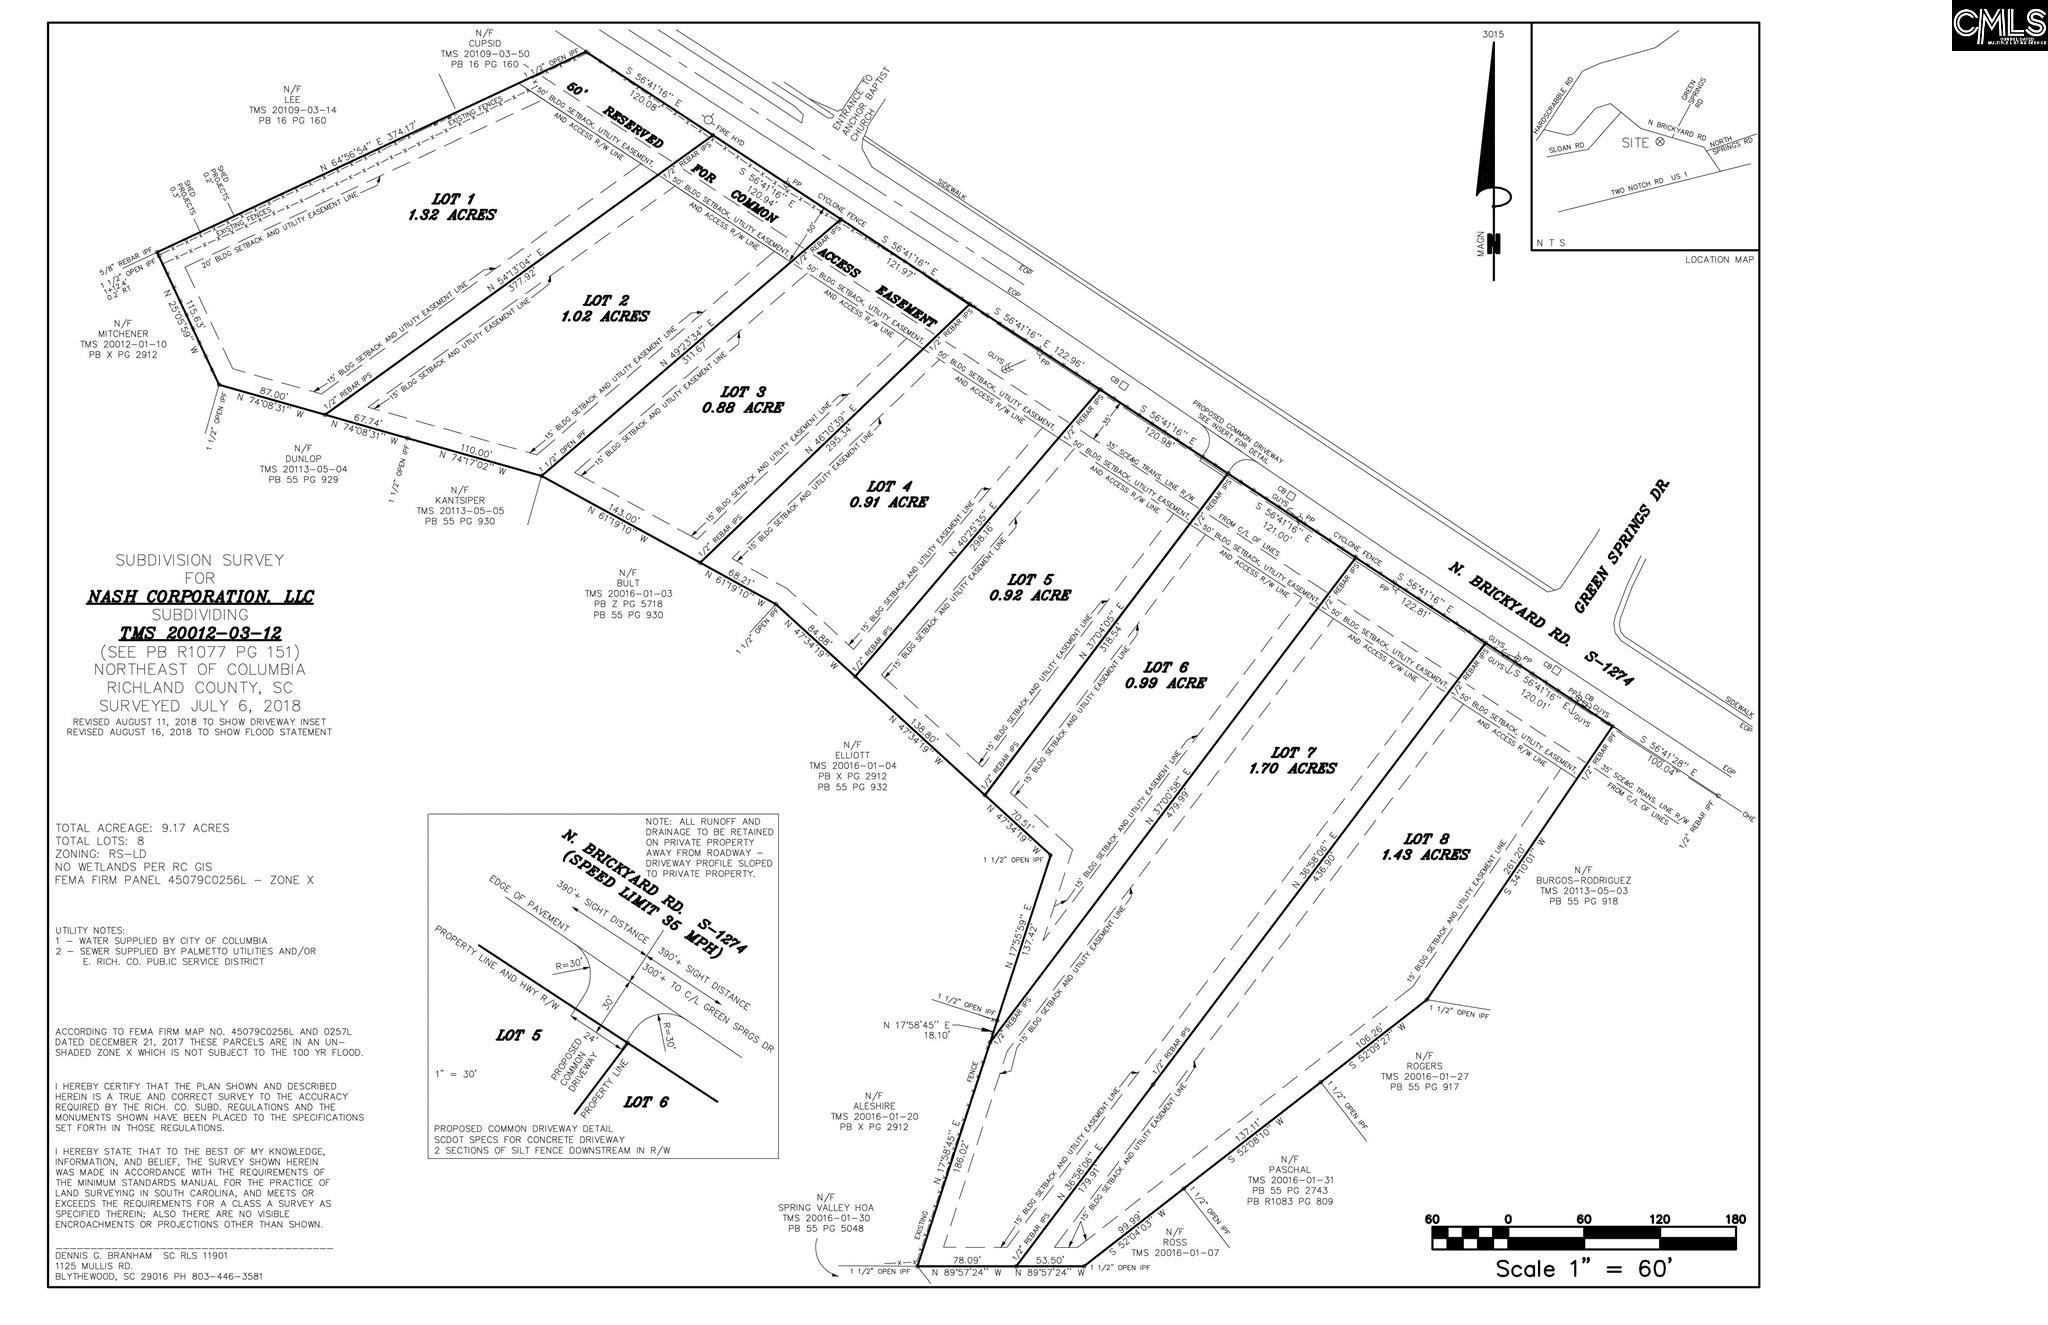 333 N Brickyard Rd. Columbia, SC 29223